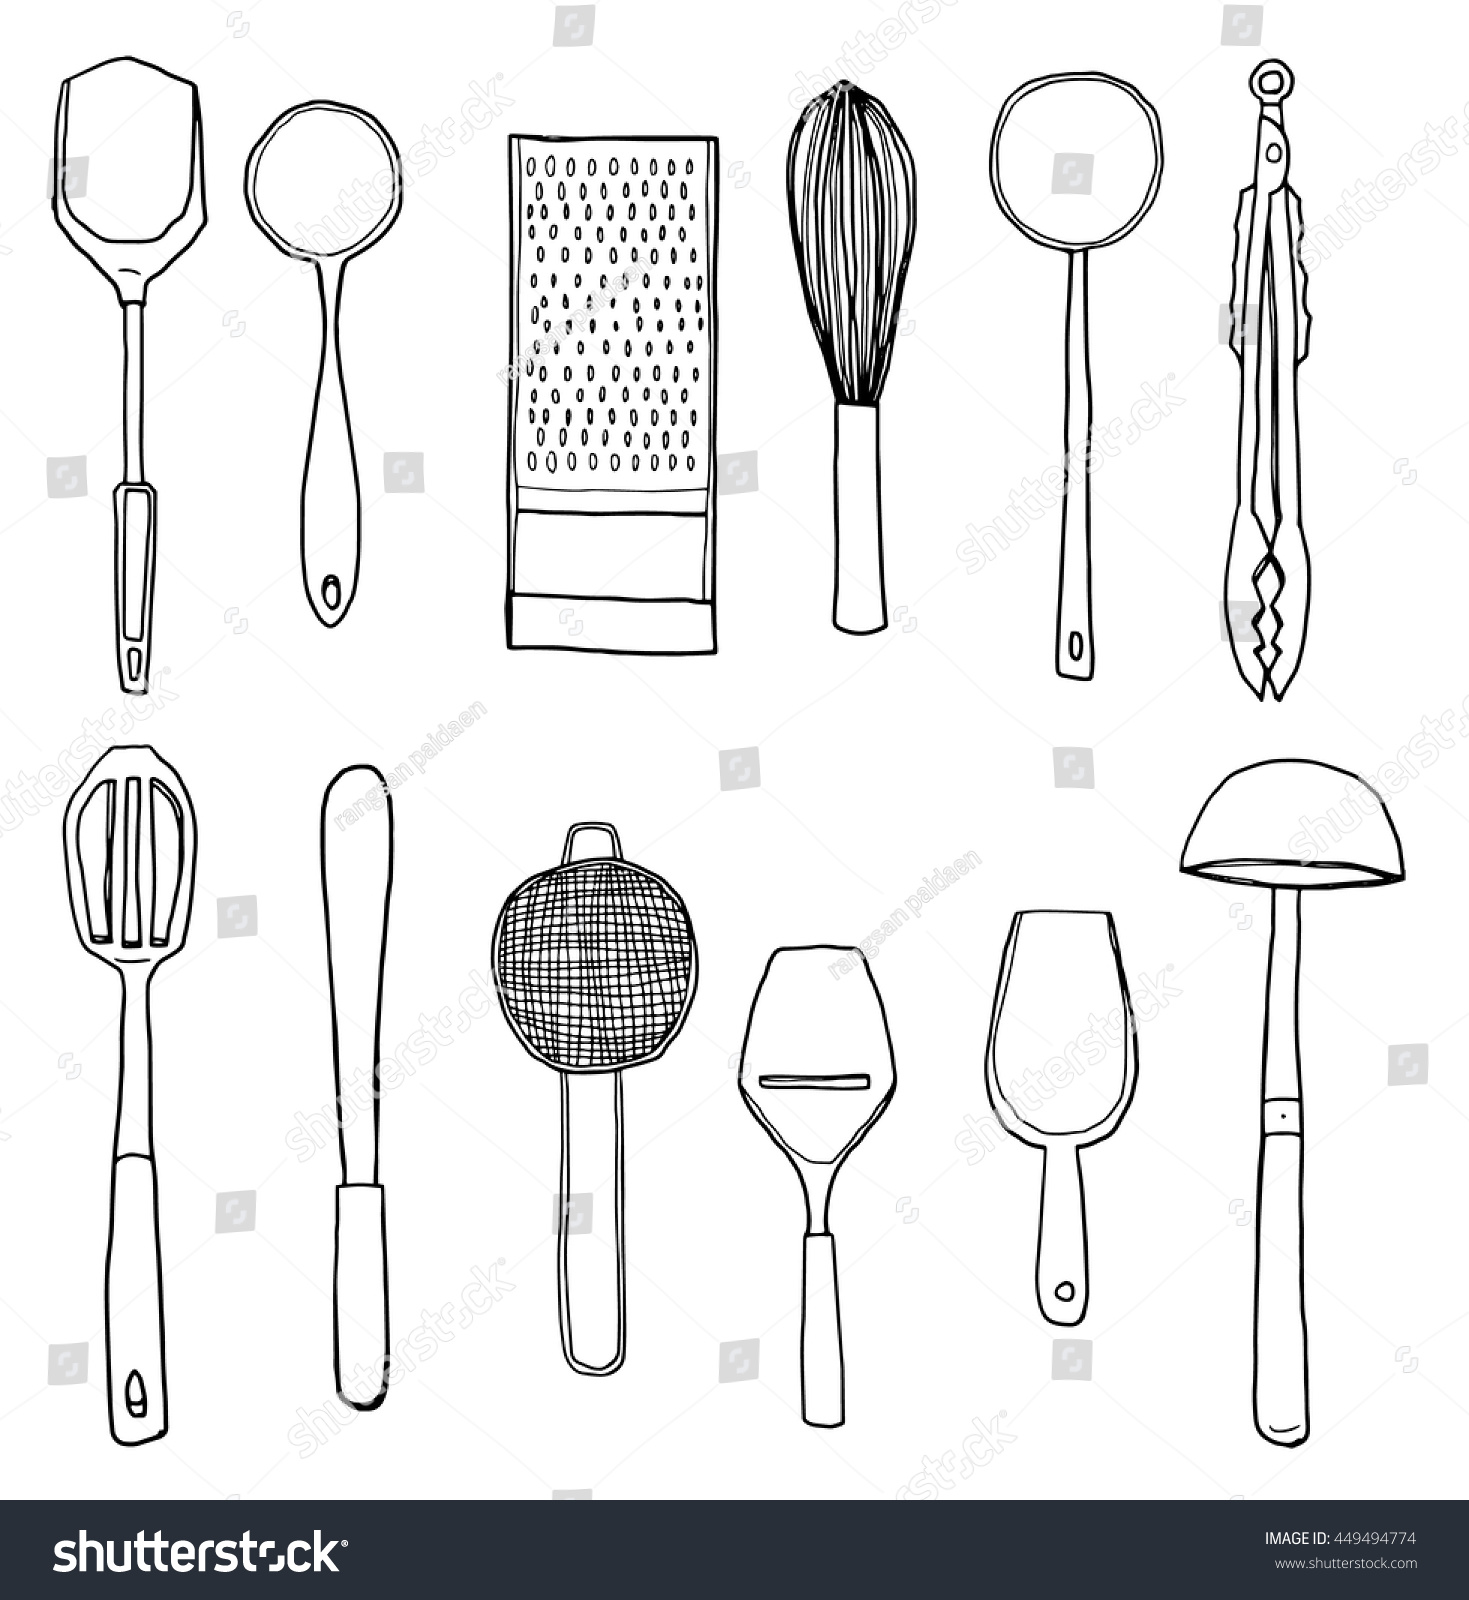 Kitchen Utensils Art vector kitchen utensils hand drawn cute stock vector 449494774